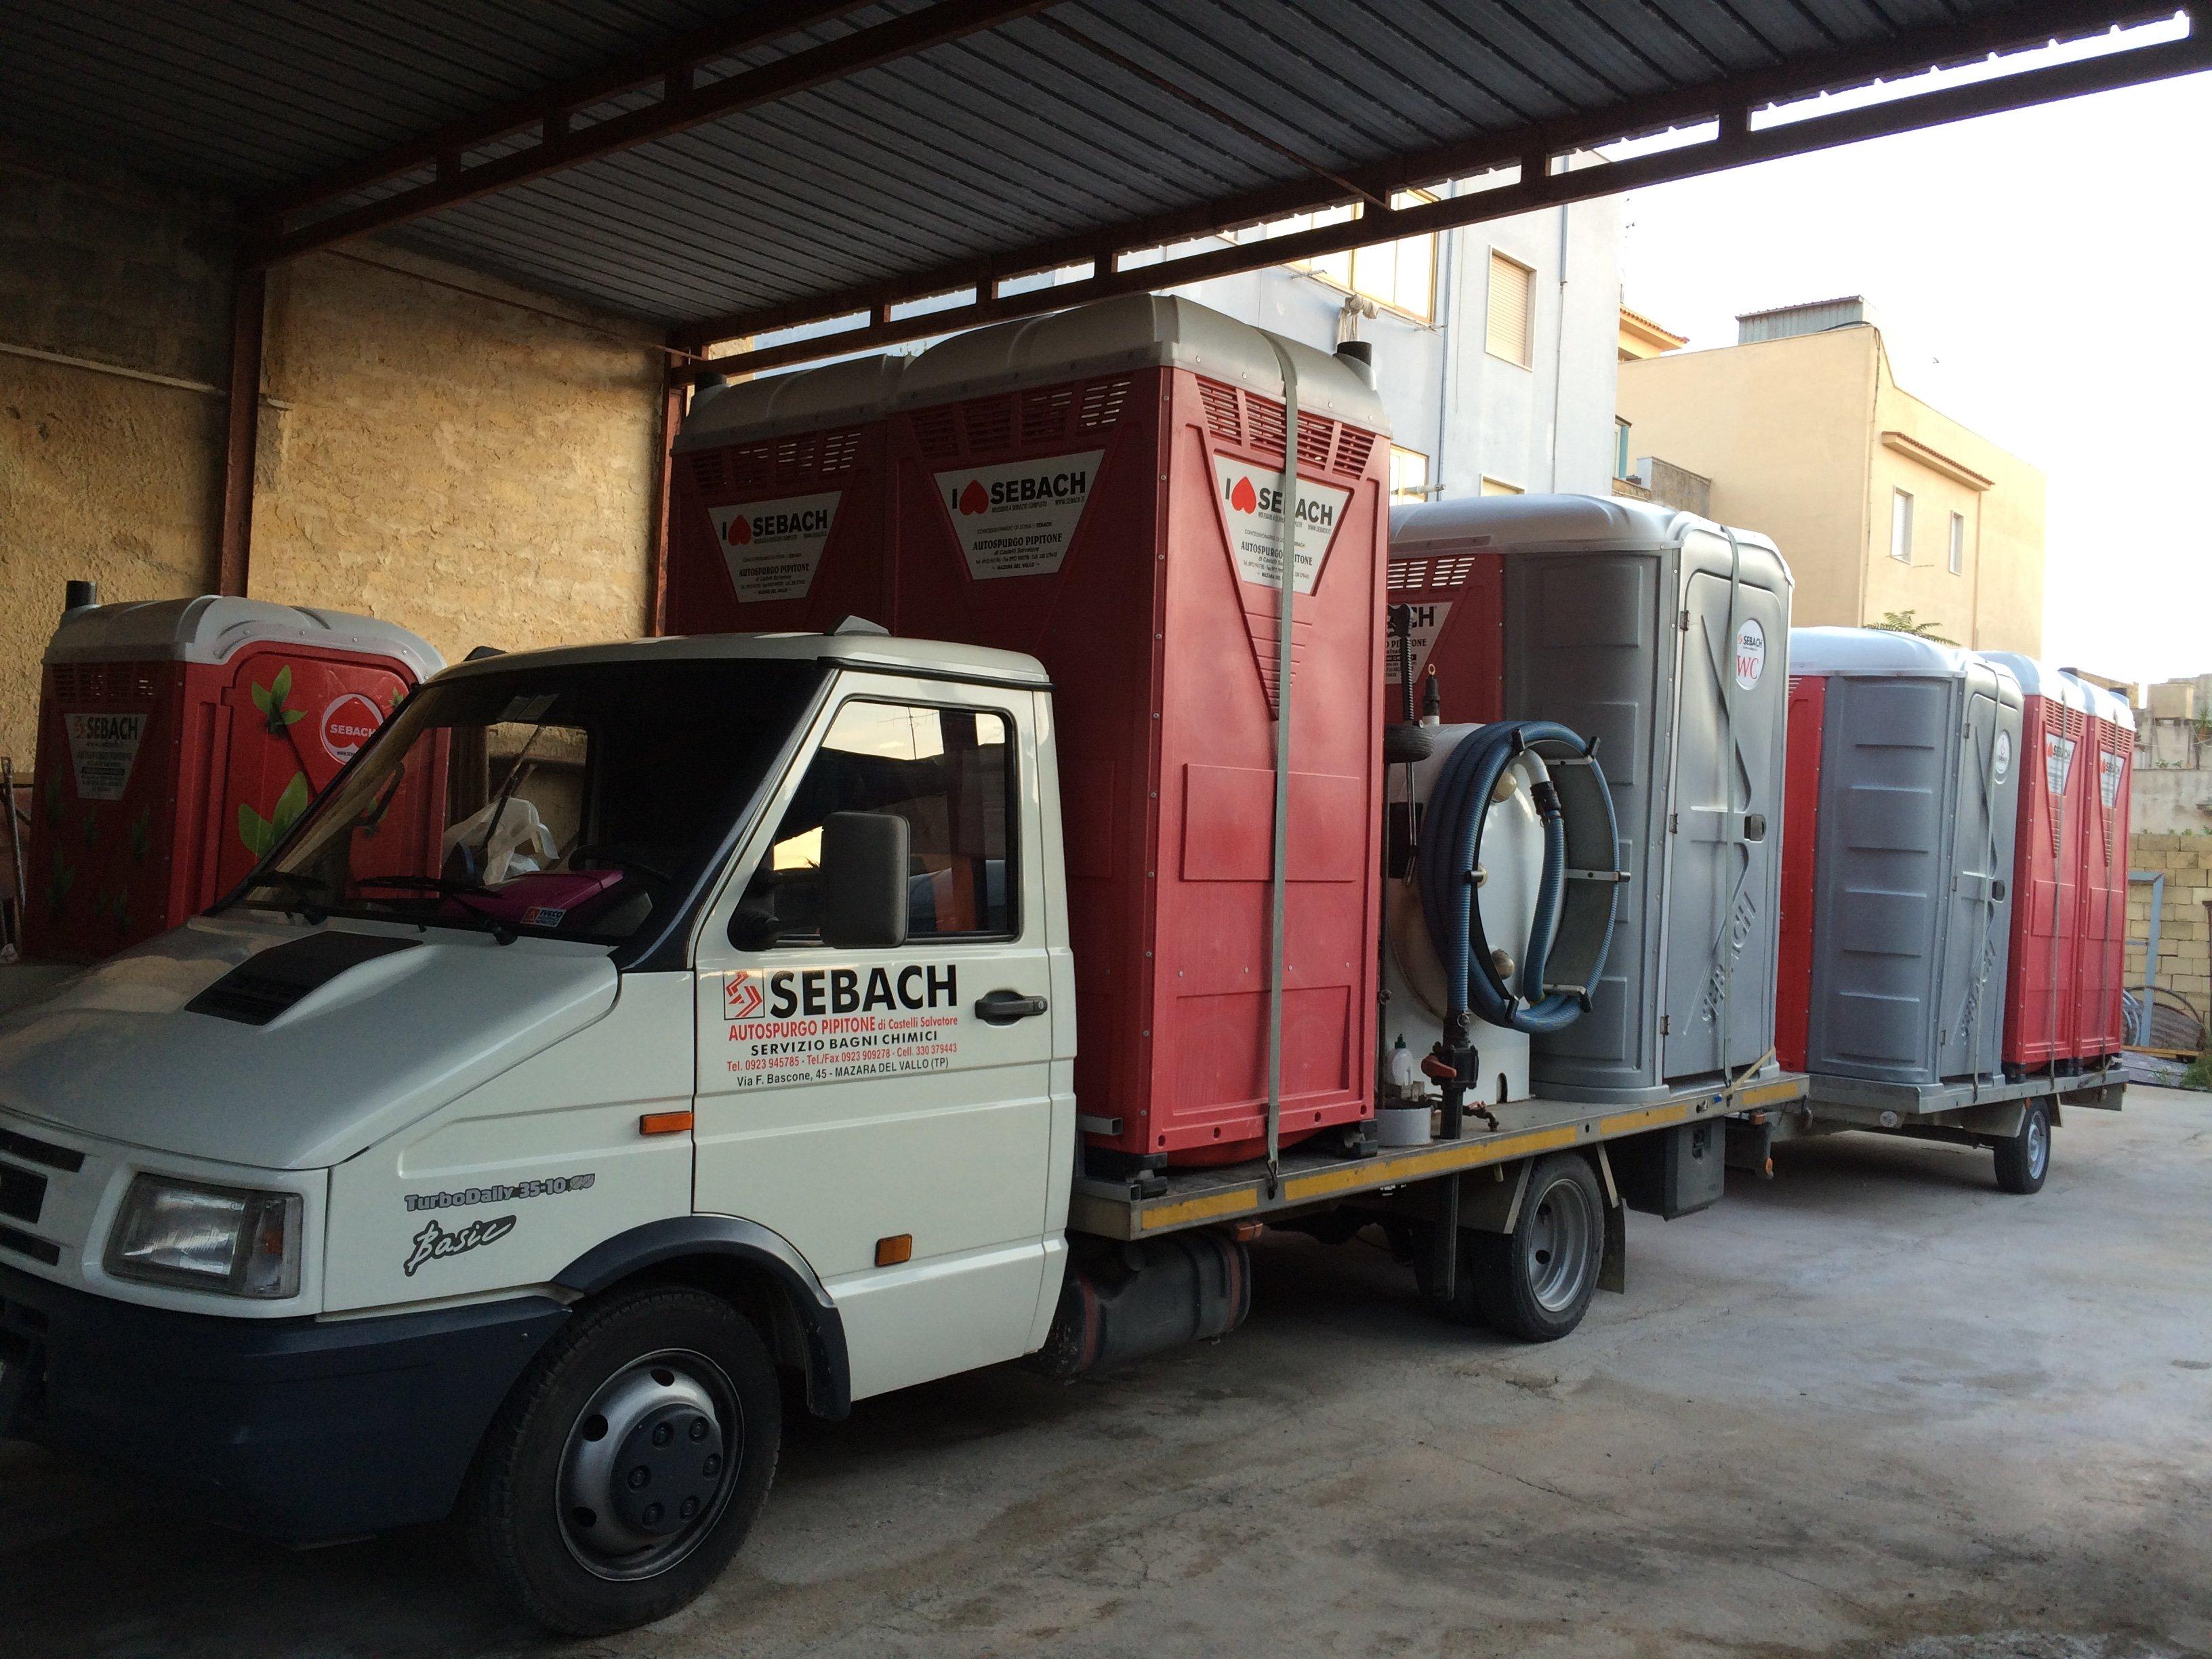 un camion carico